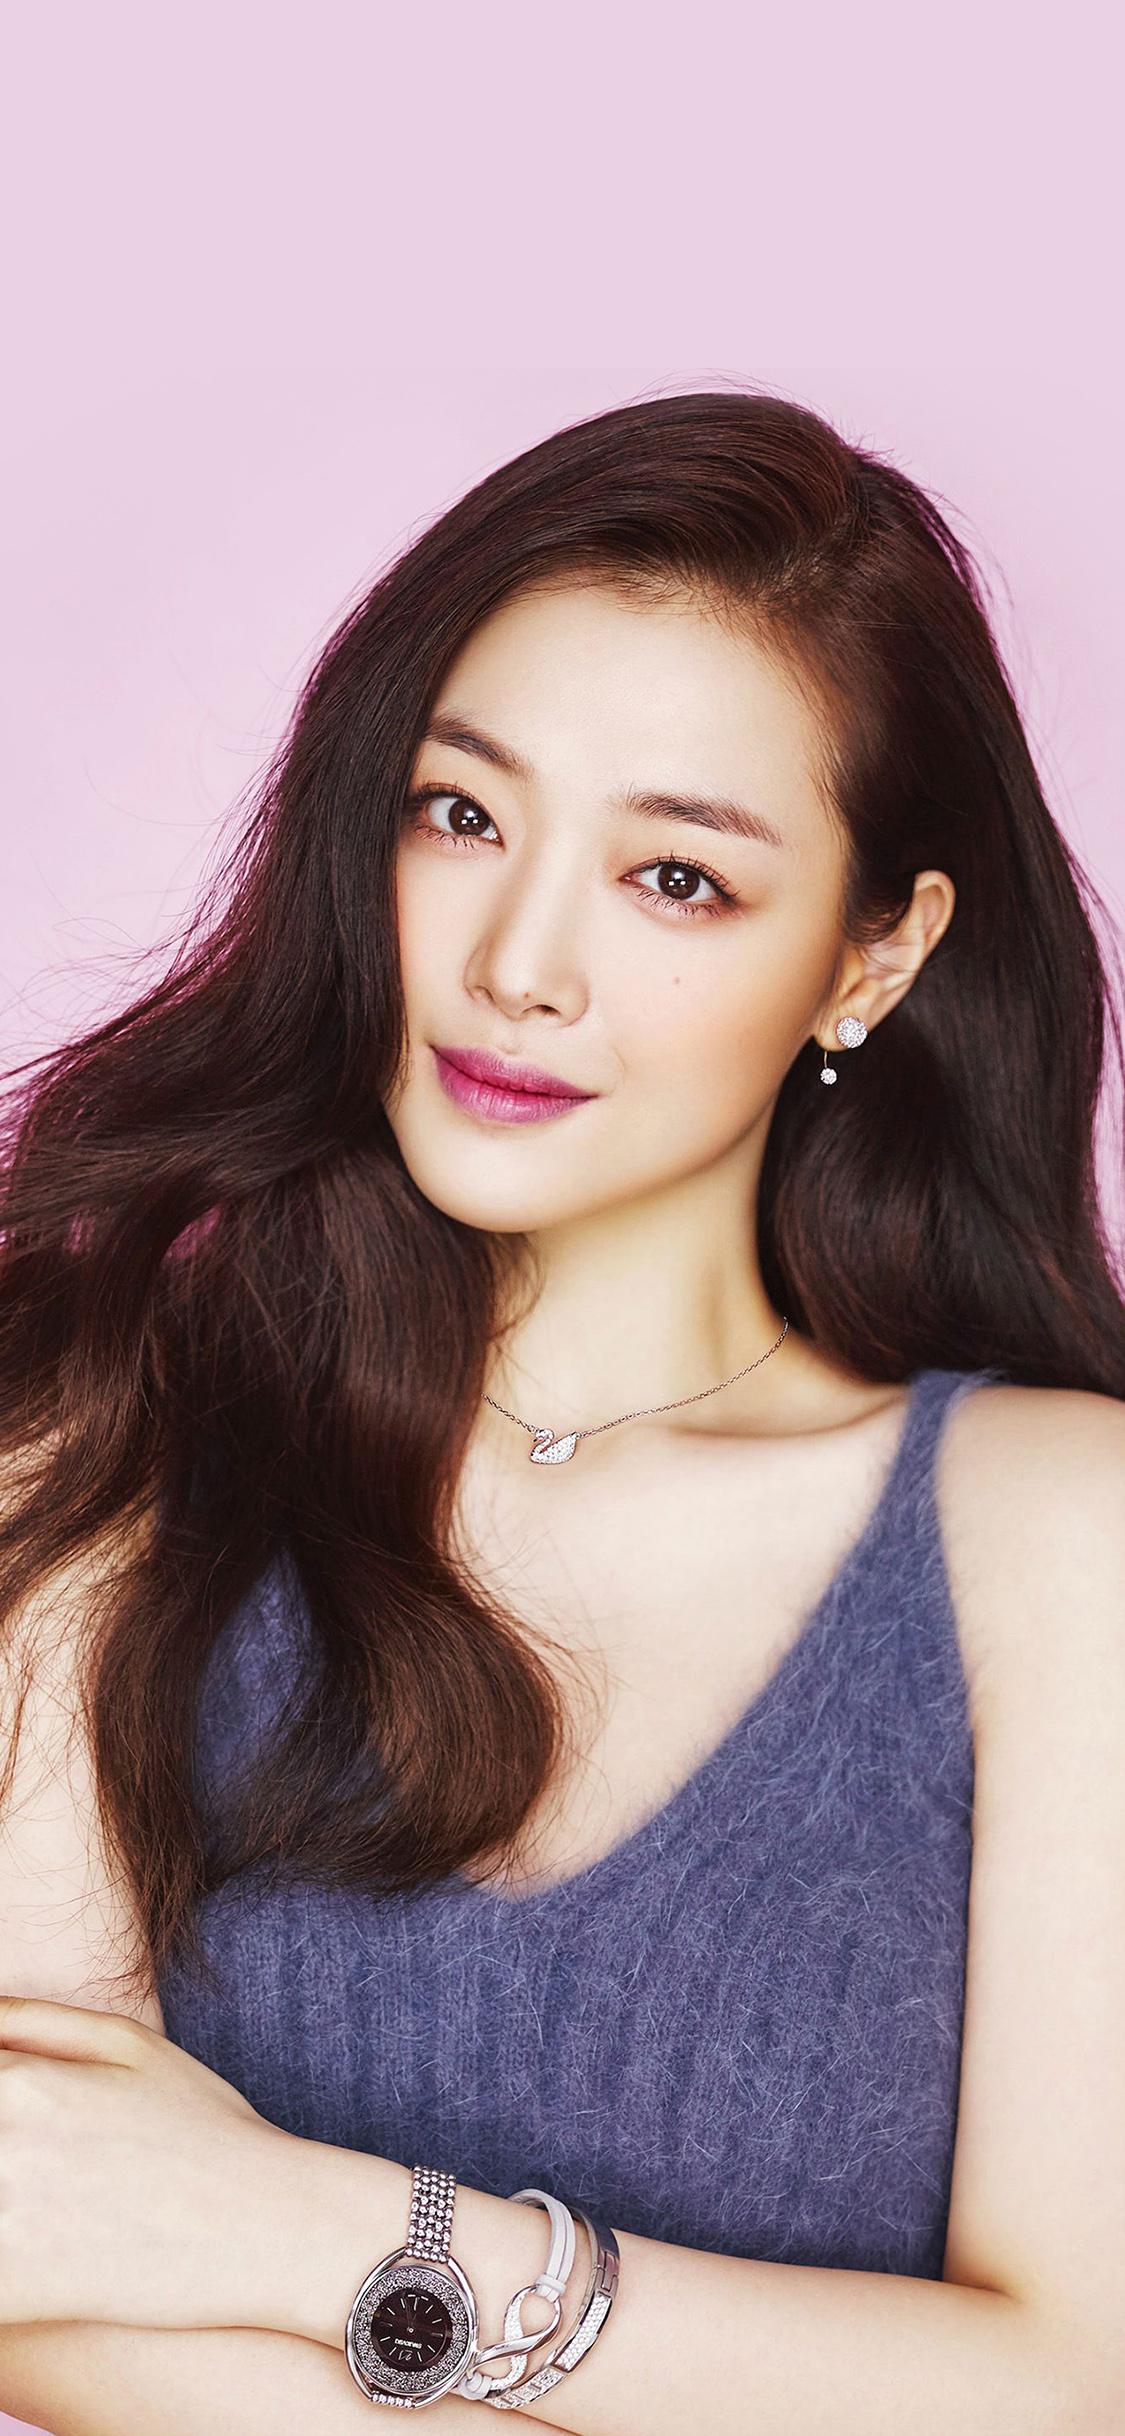 iPhoneXpapers.com-Apple-iPhone-wallpaper-hj13-sulli-kpop-pink-cute-girl-asian